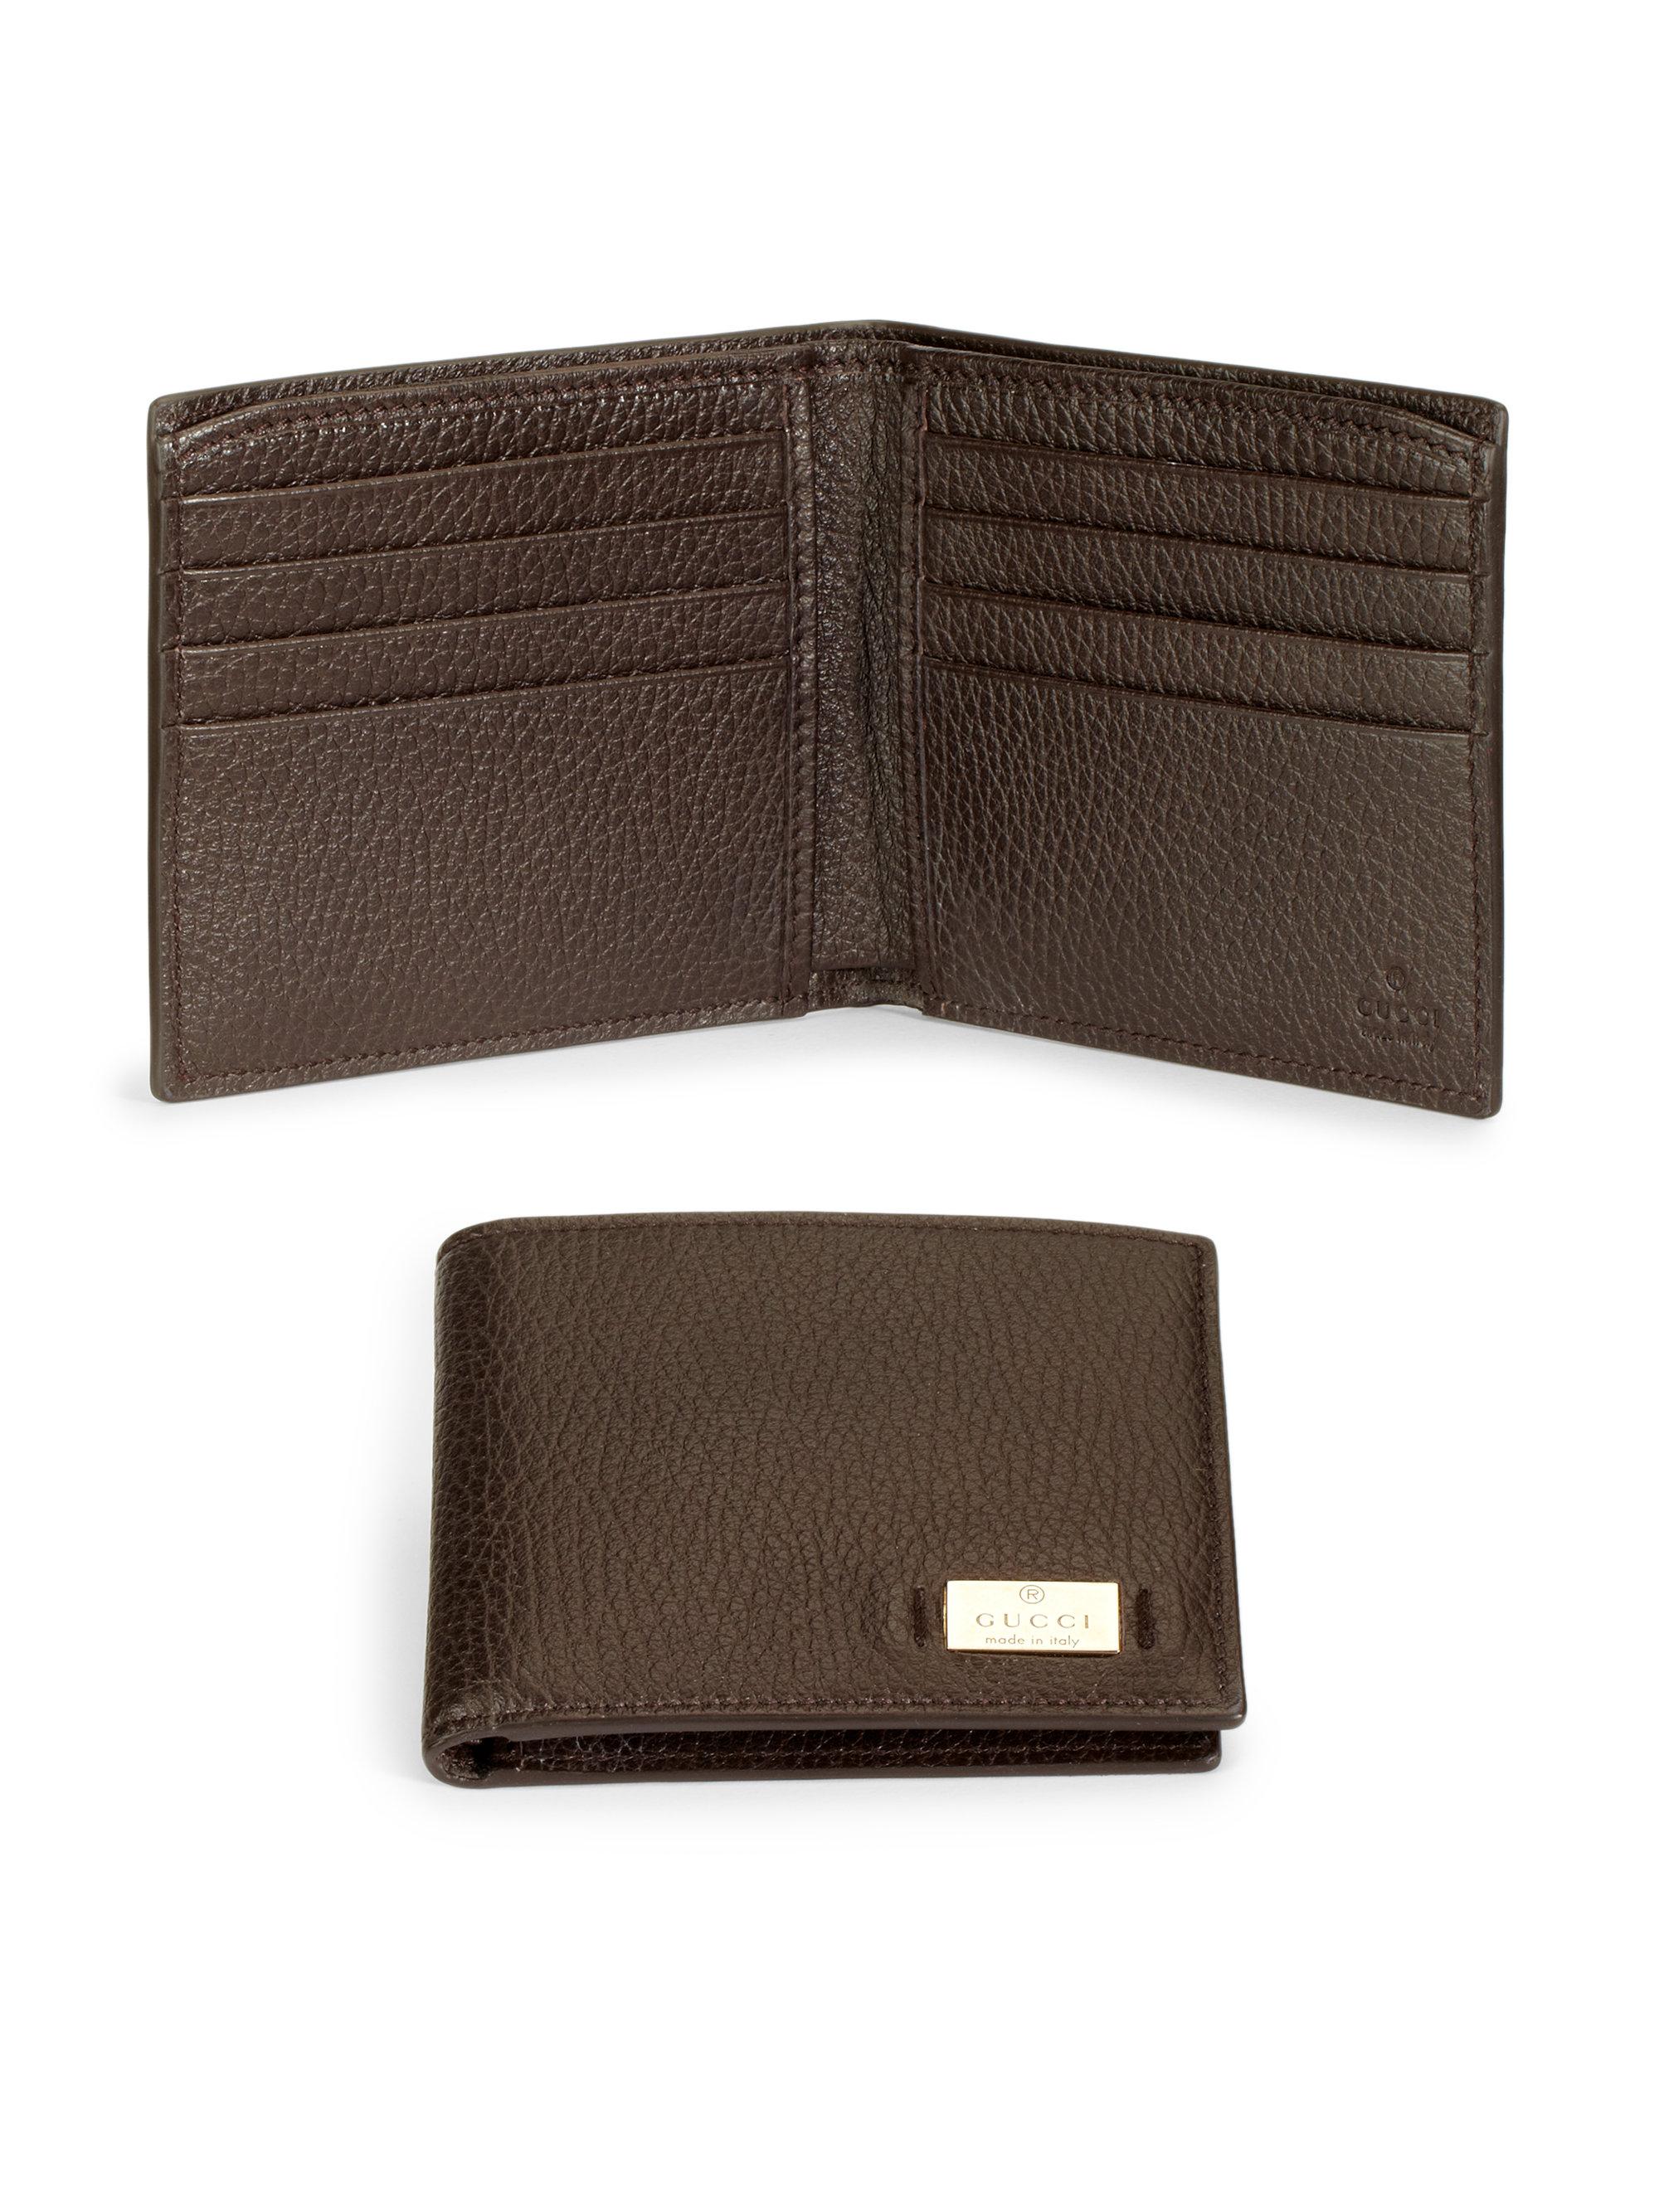 cdbe3d7ea3e Gucci metal bar coin wallet upgrades   Wanchain ico uniform for sale